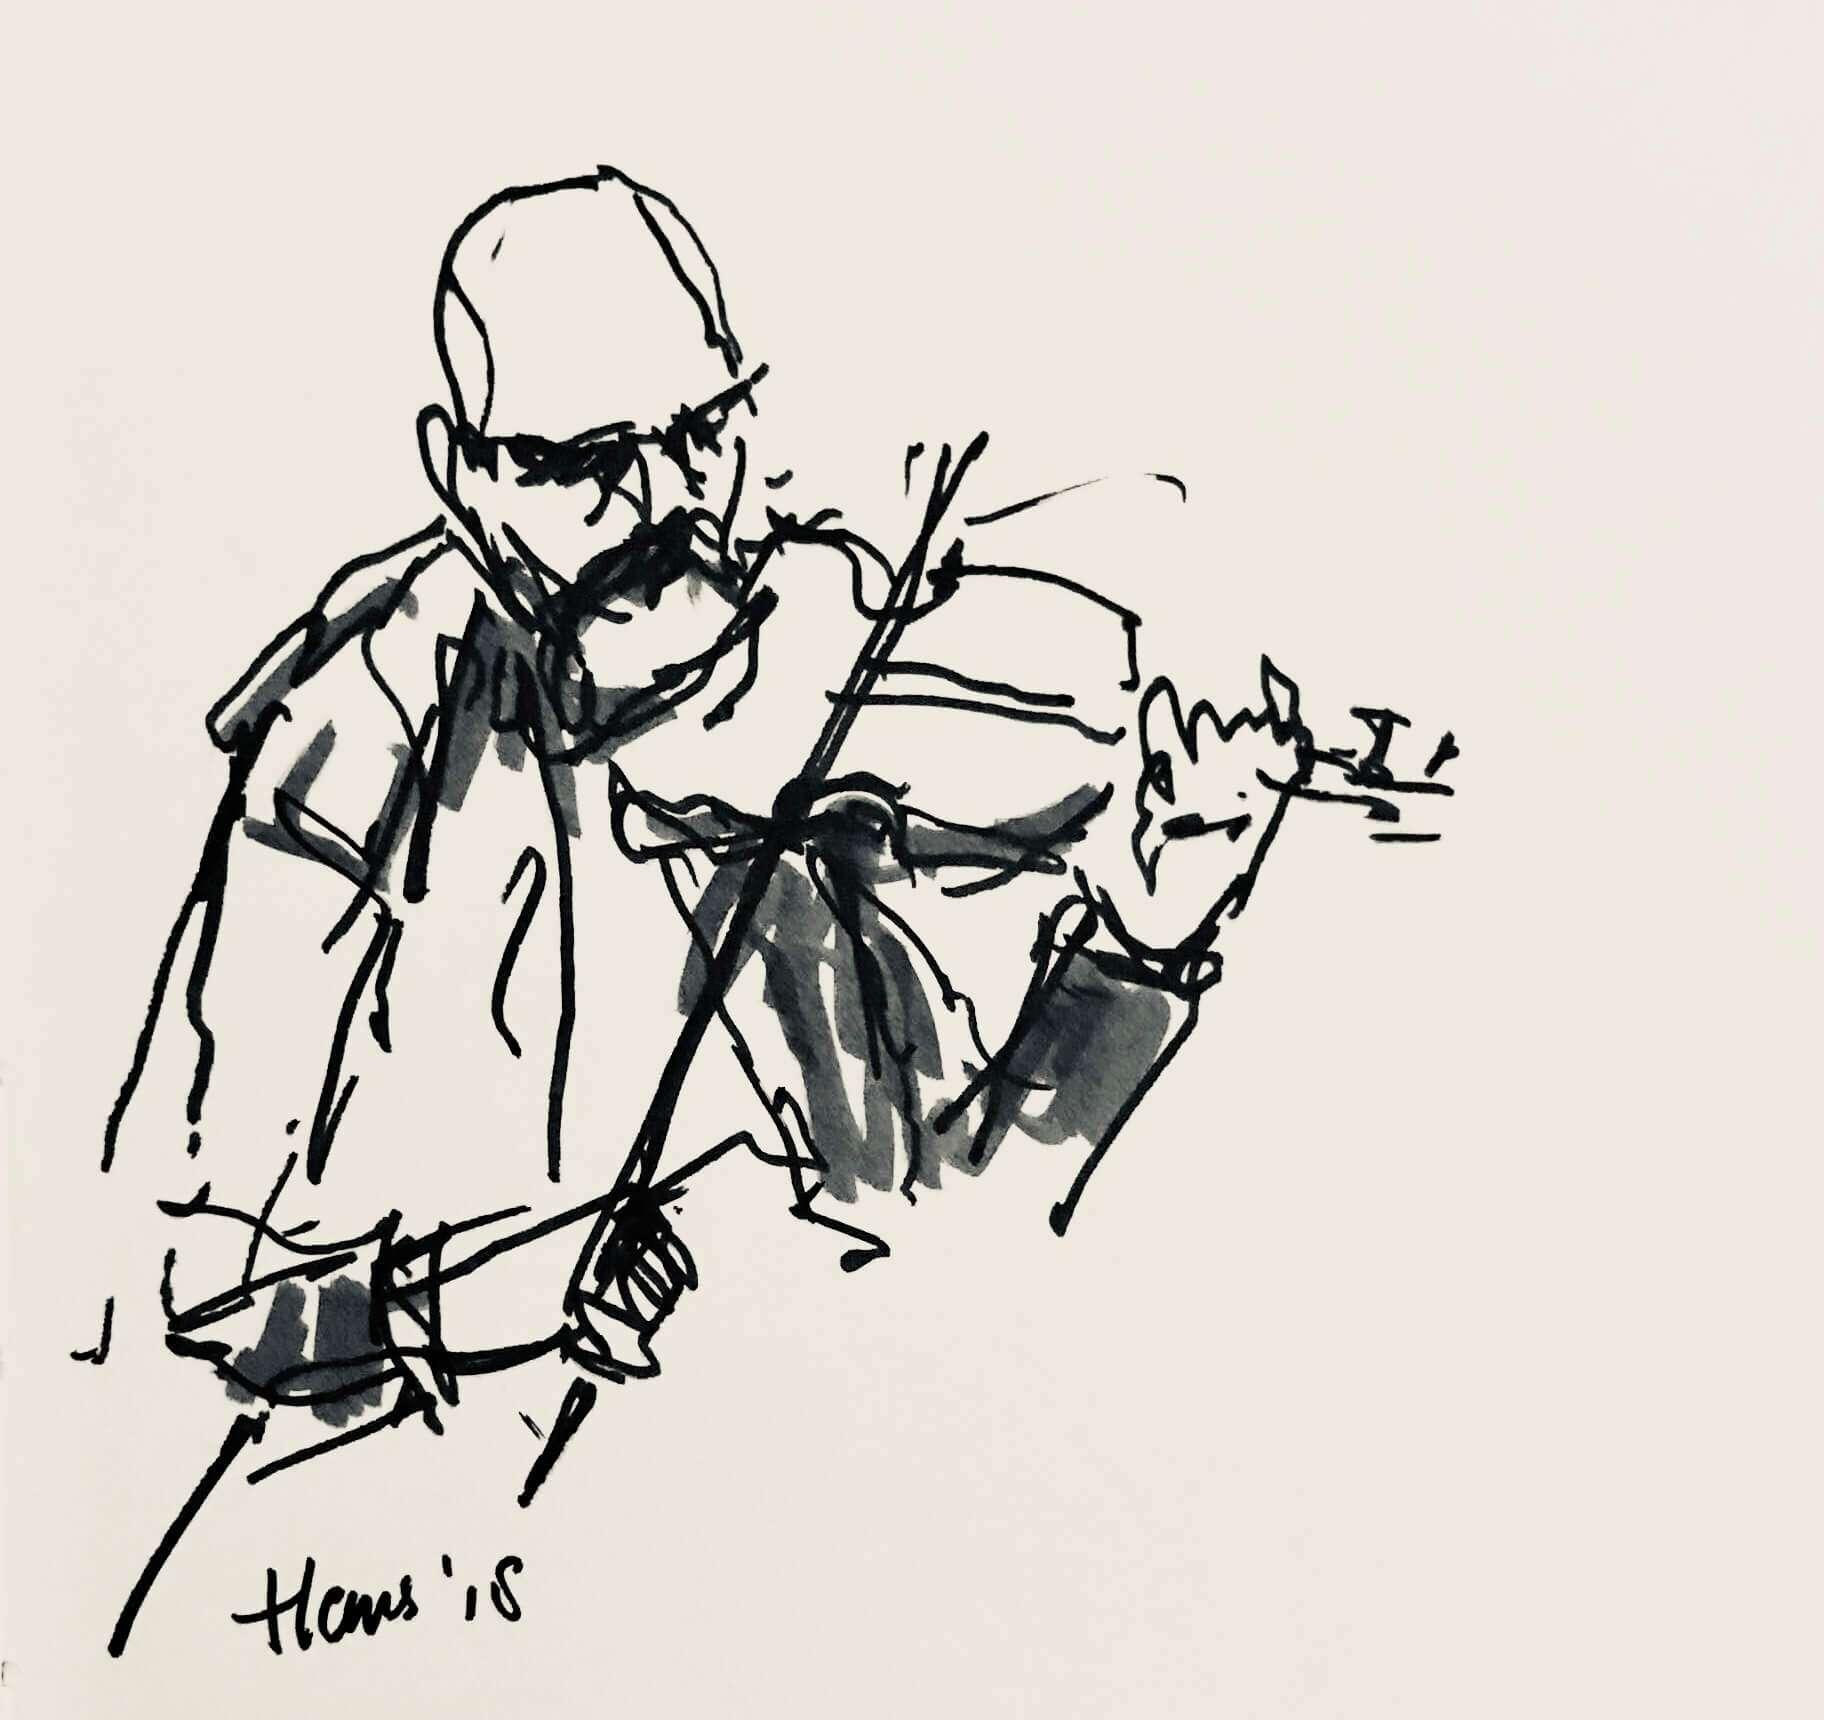 violinist1